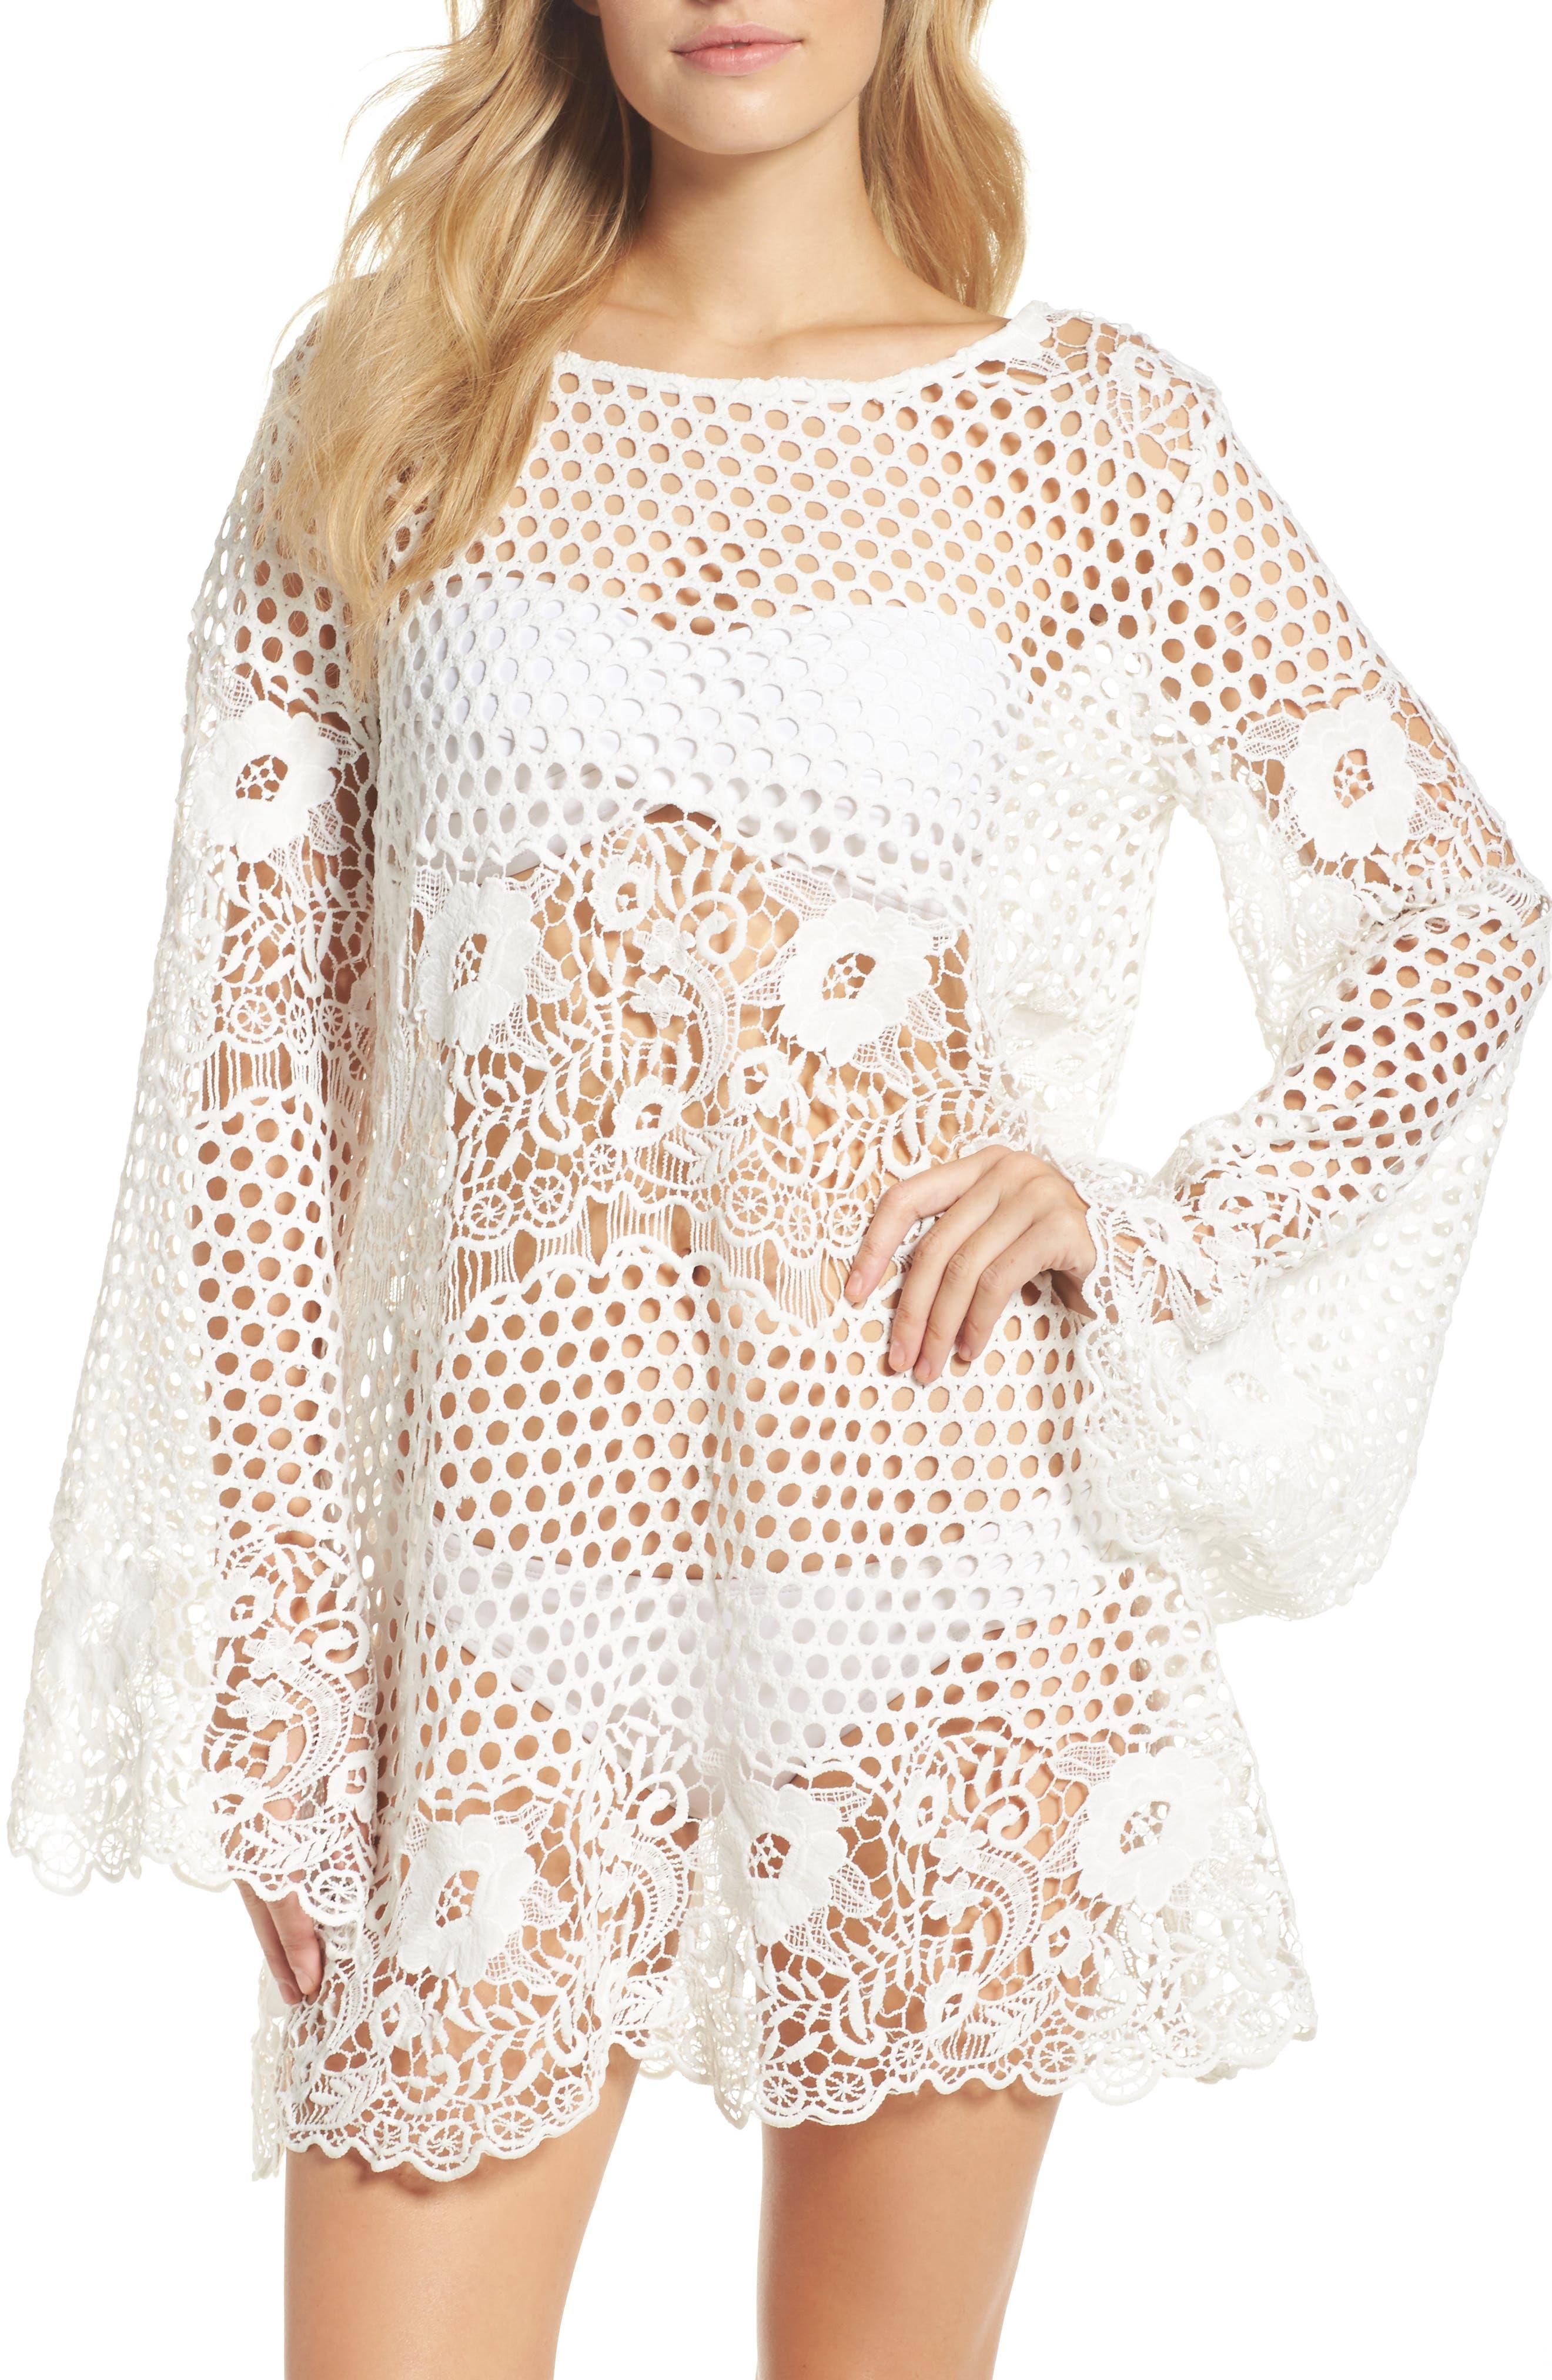 Main Image - Muche et Muchette Crochet Cover-Up